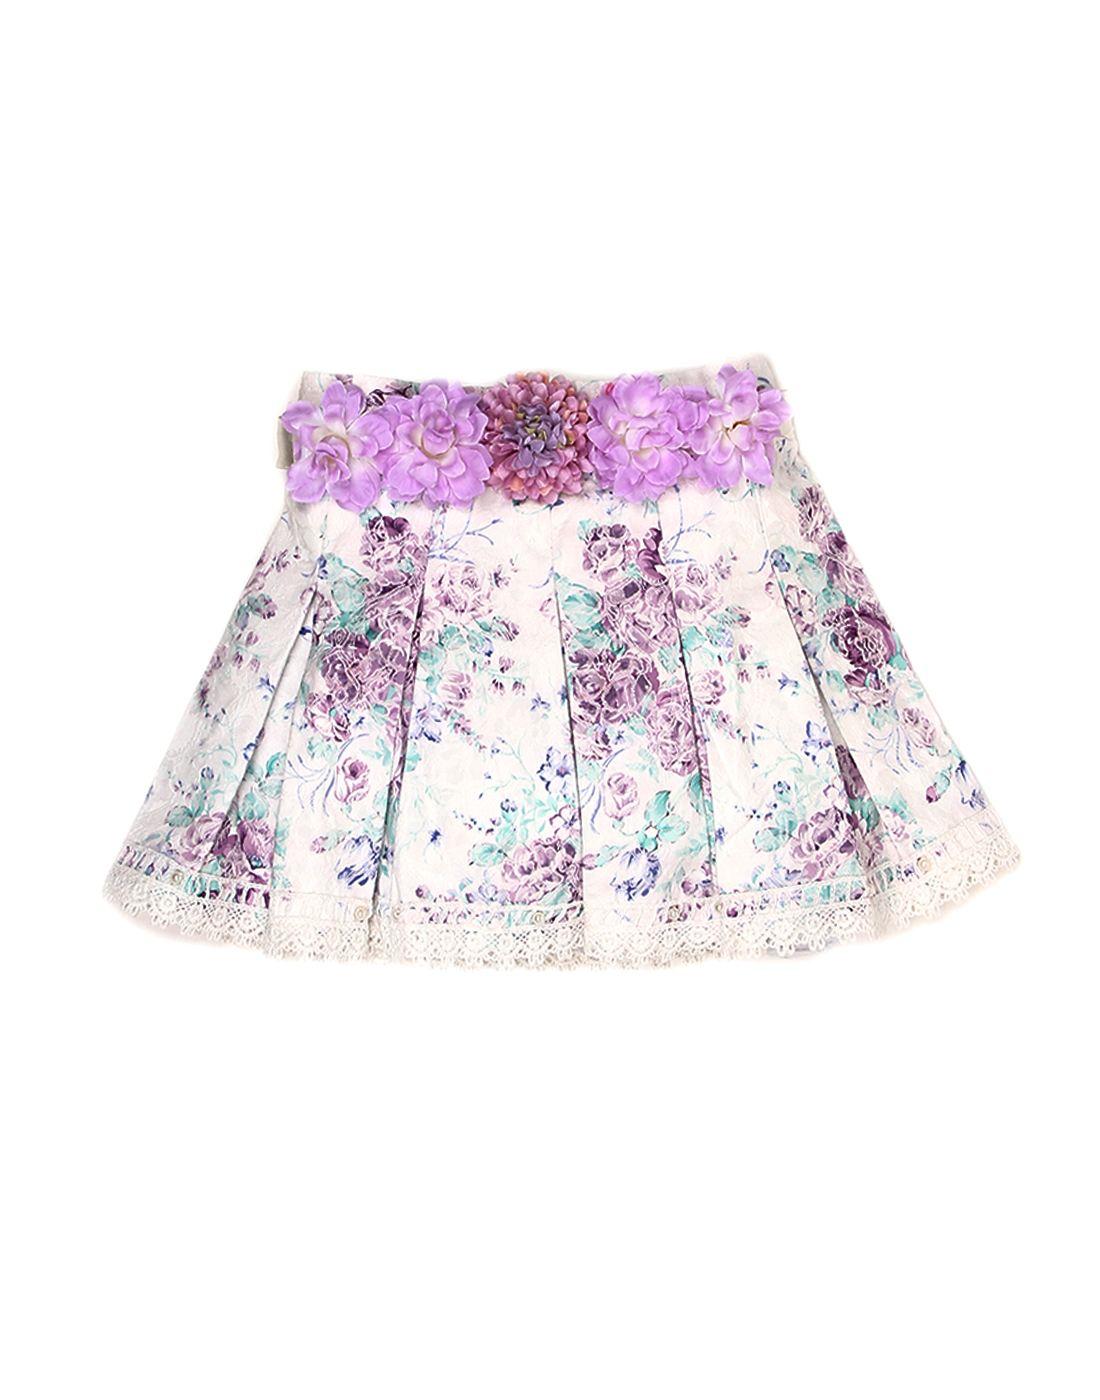 K.C.O 89 Girls Casual Printed  Skirt